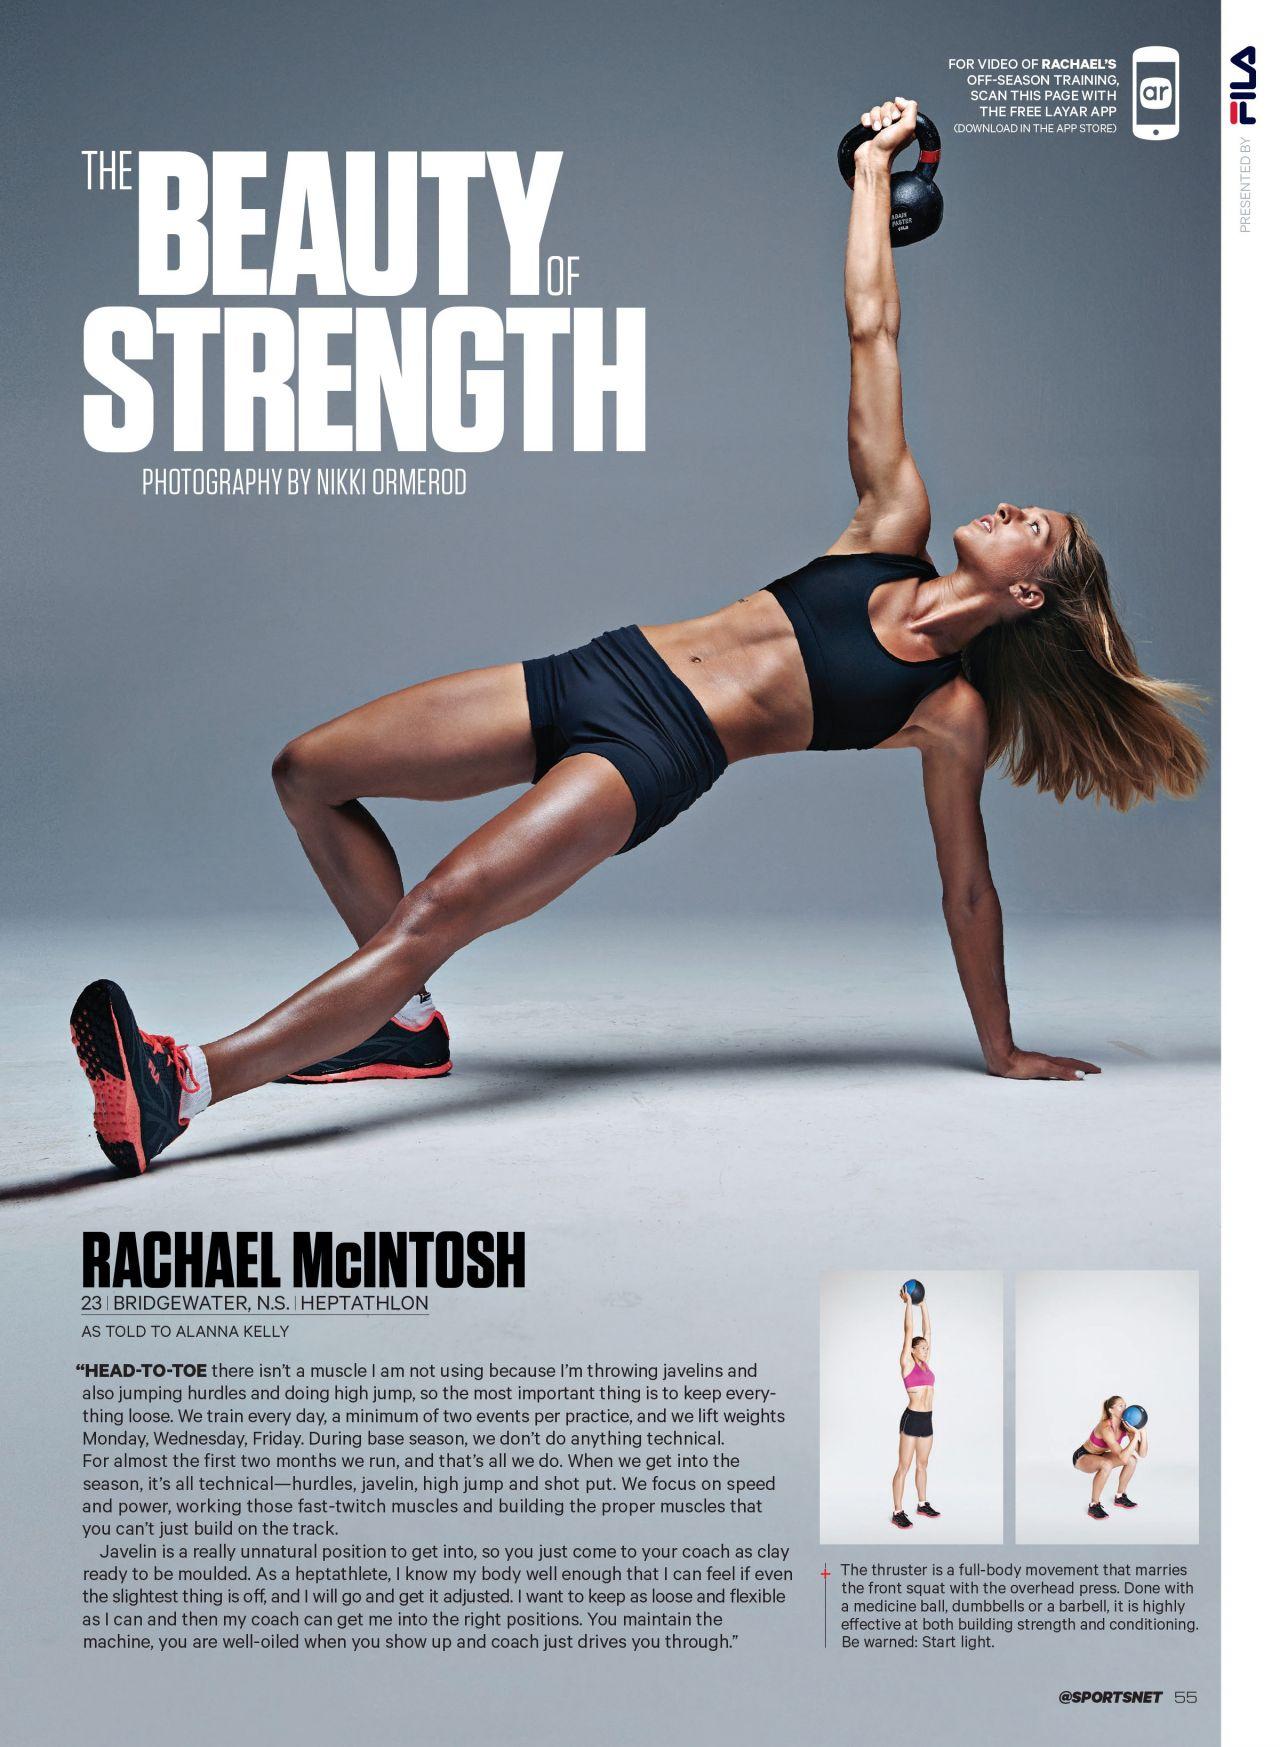 Rachael McIntosh - Sportsnet Magazine (Canada) - August 18, 2014